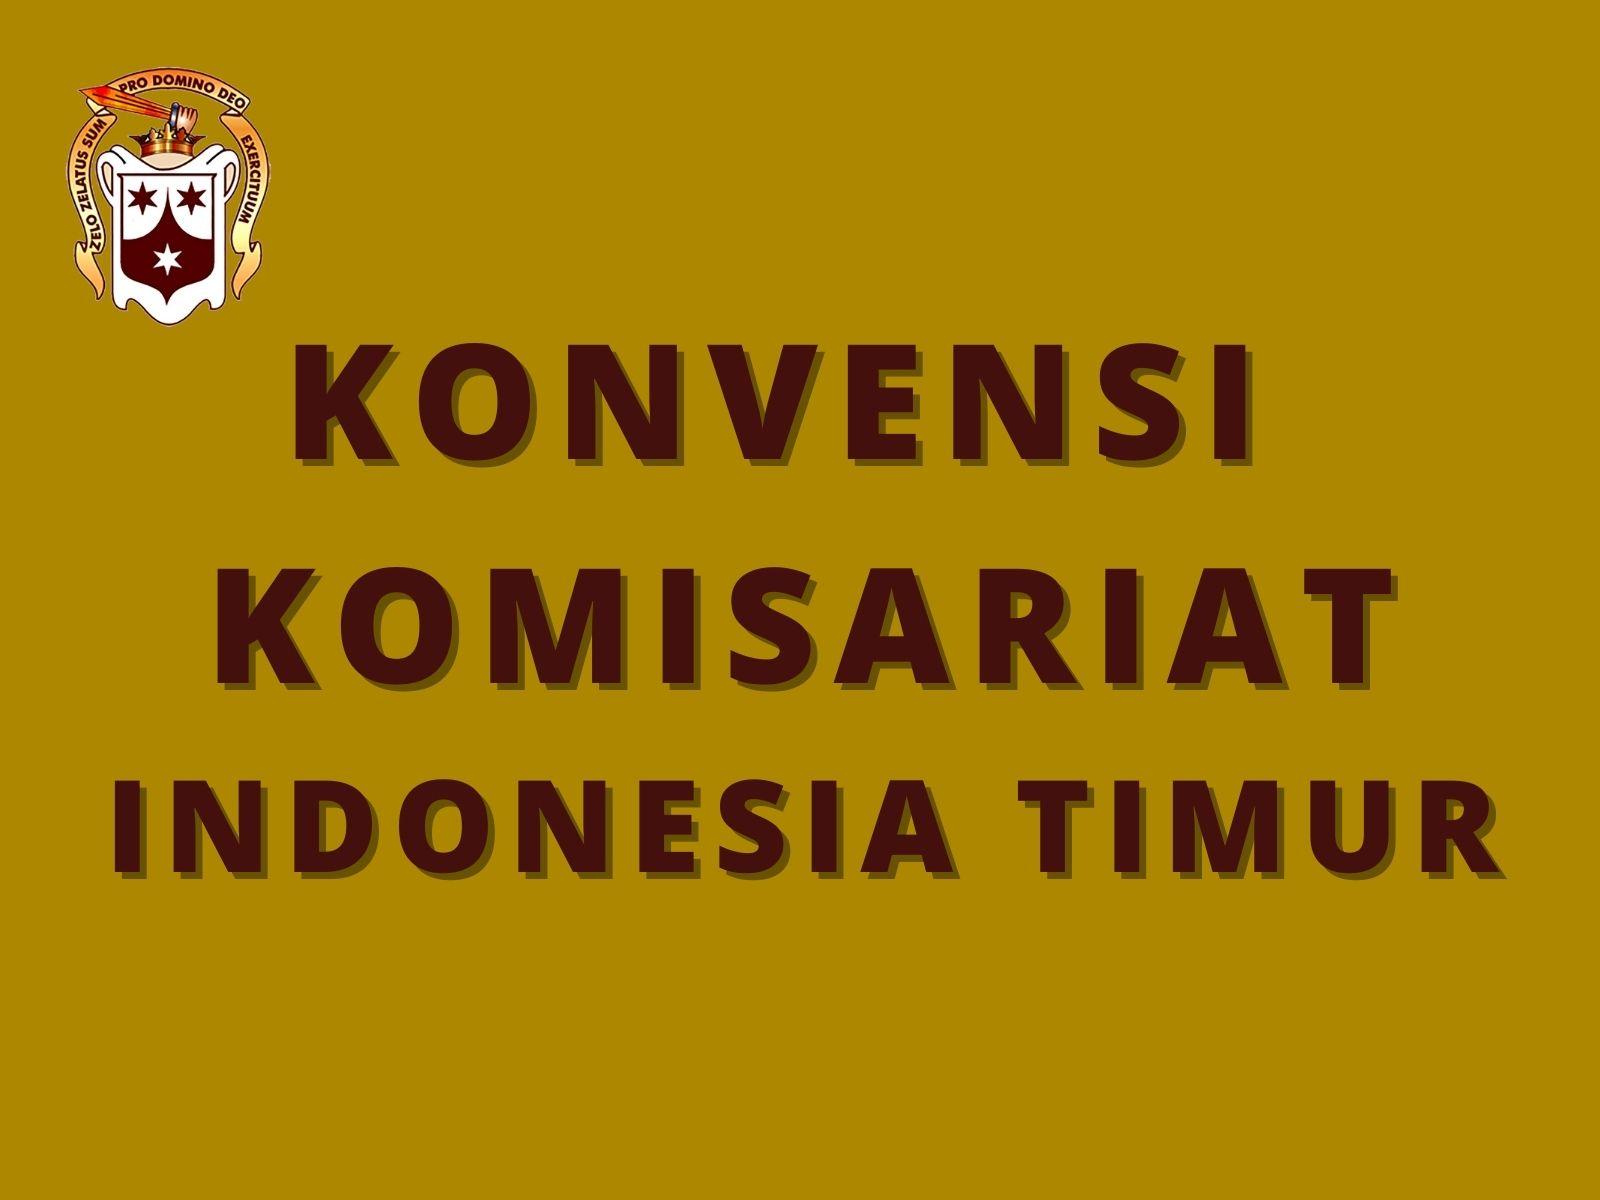 Konvensi Komisariat Indonesia Timur